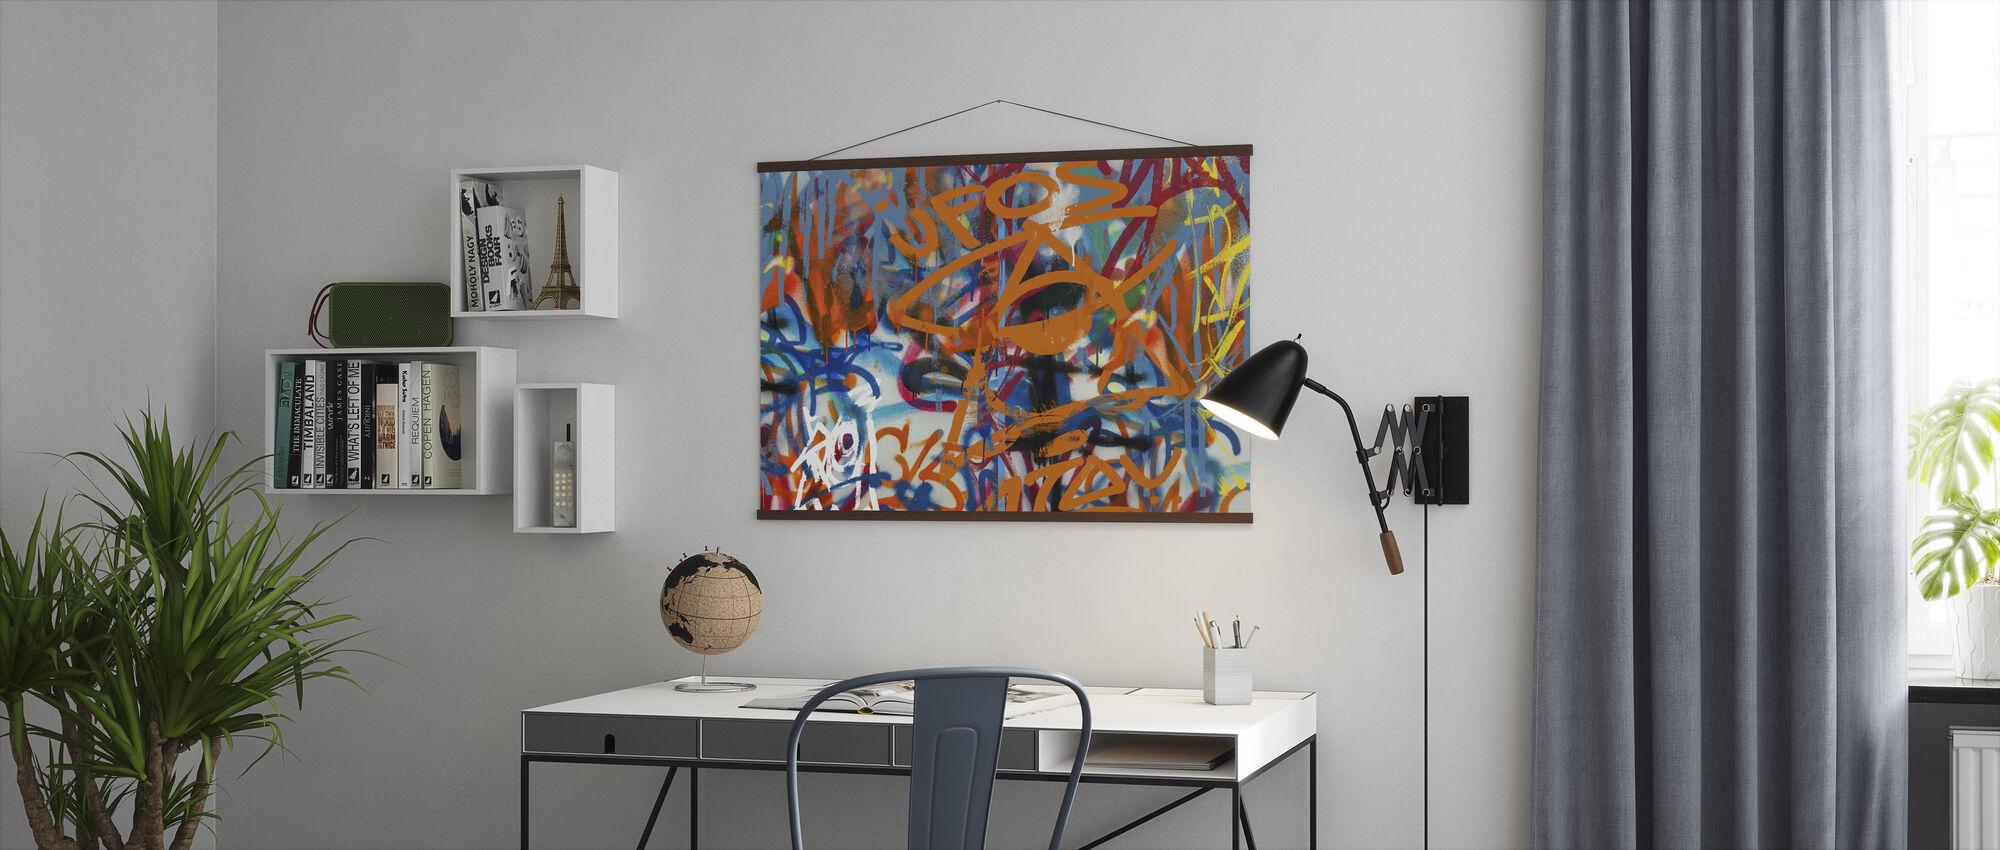 Graffiti Abstract Art - Poster - Office